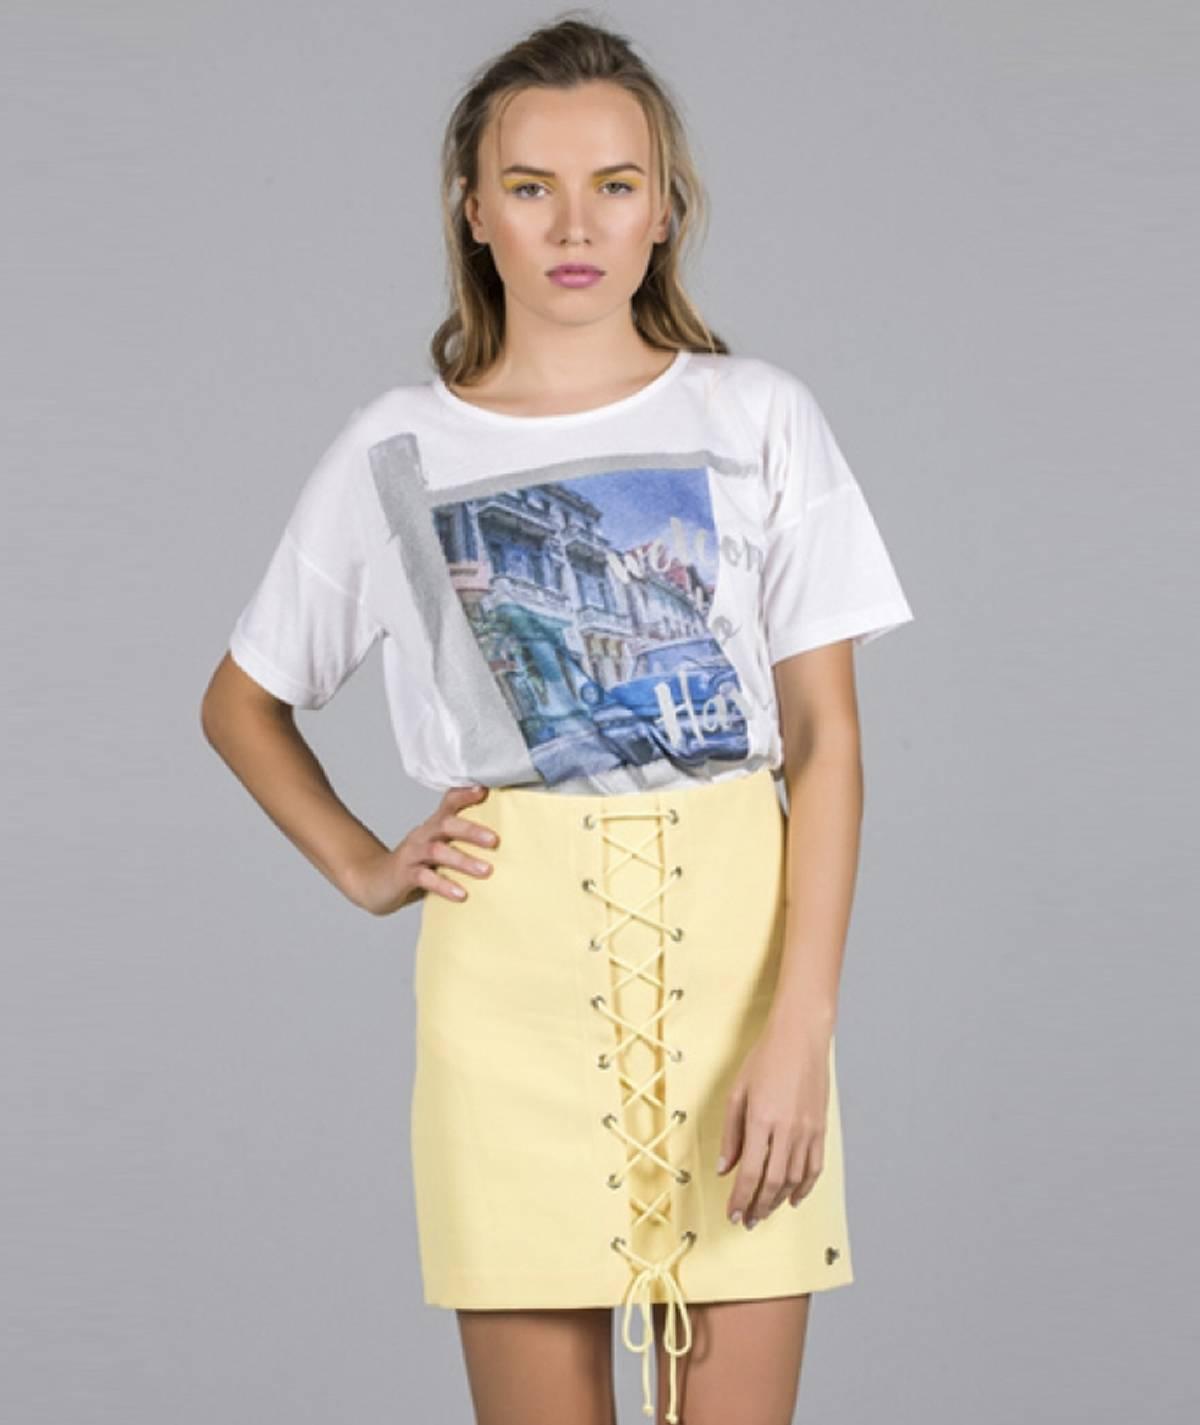 [CHIESSY] T-shirt havana